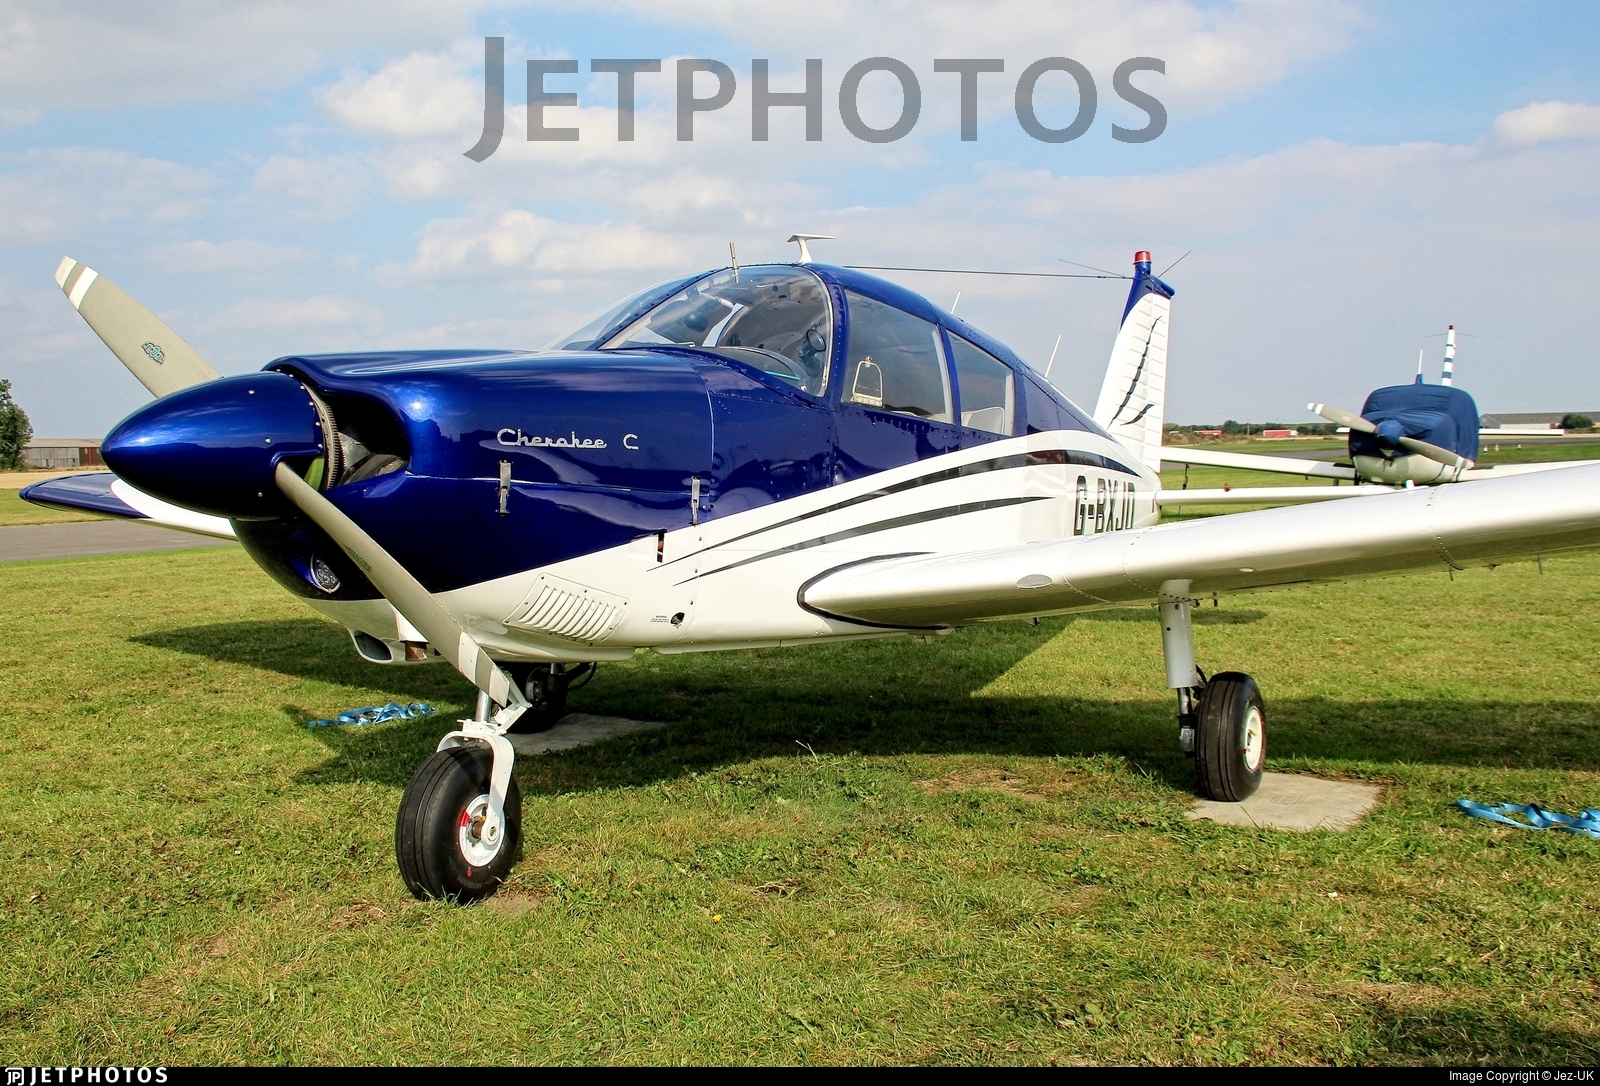 G-BXJD - Piper PA-28-180 Cherokee C - Private